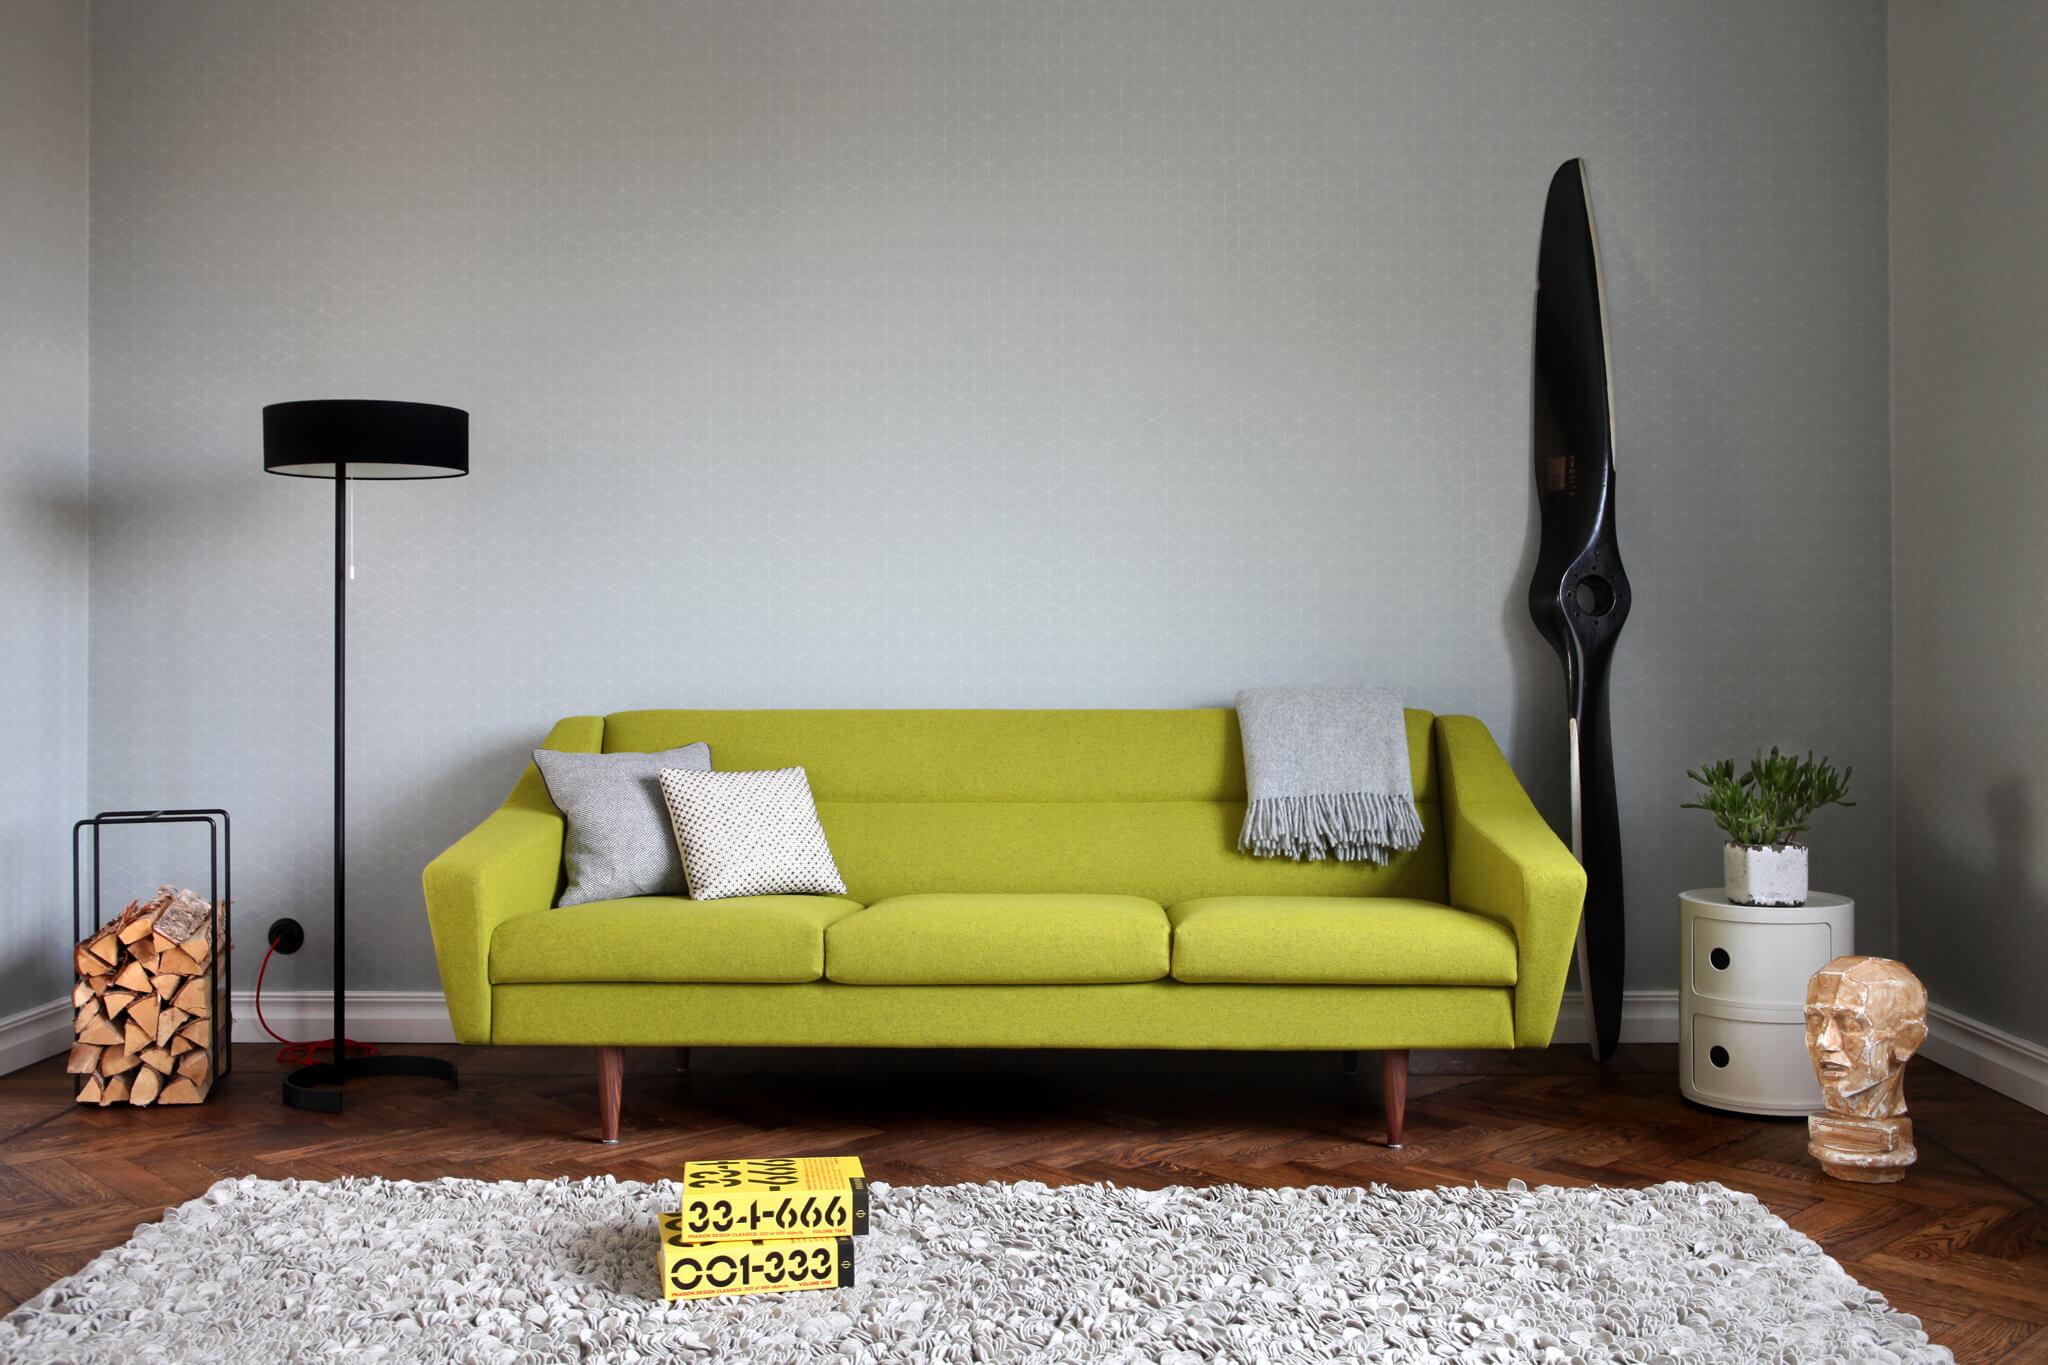 sofa_cosmo_2048 diivan kontorisse